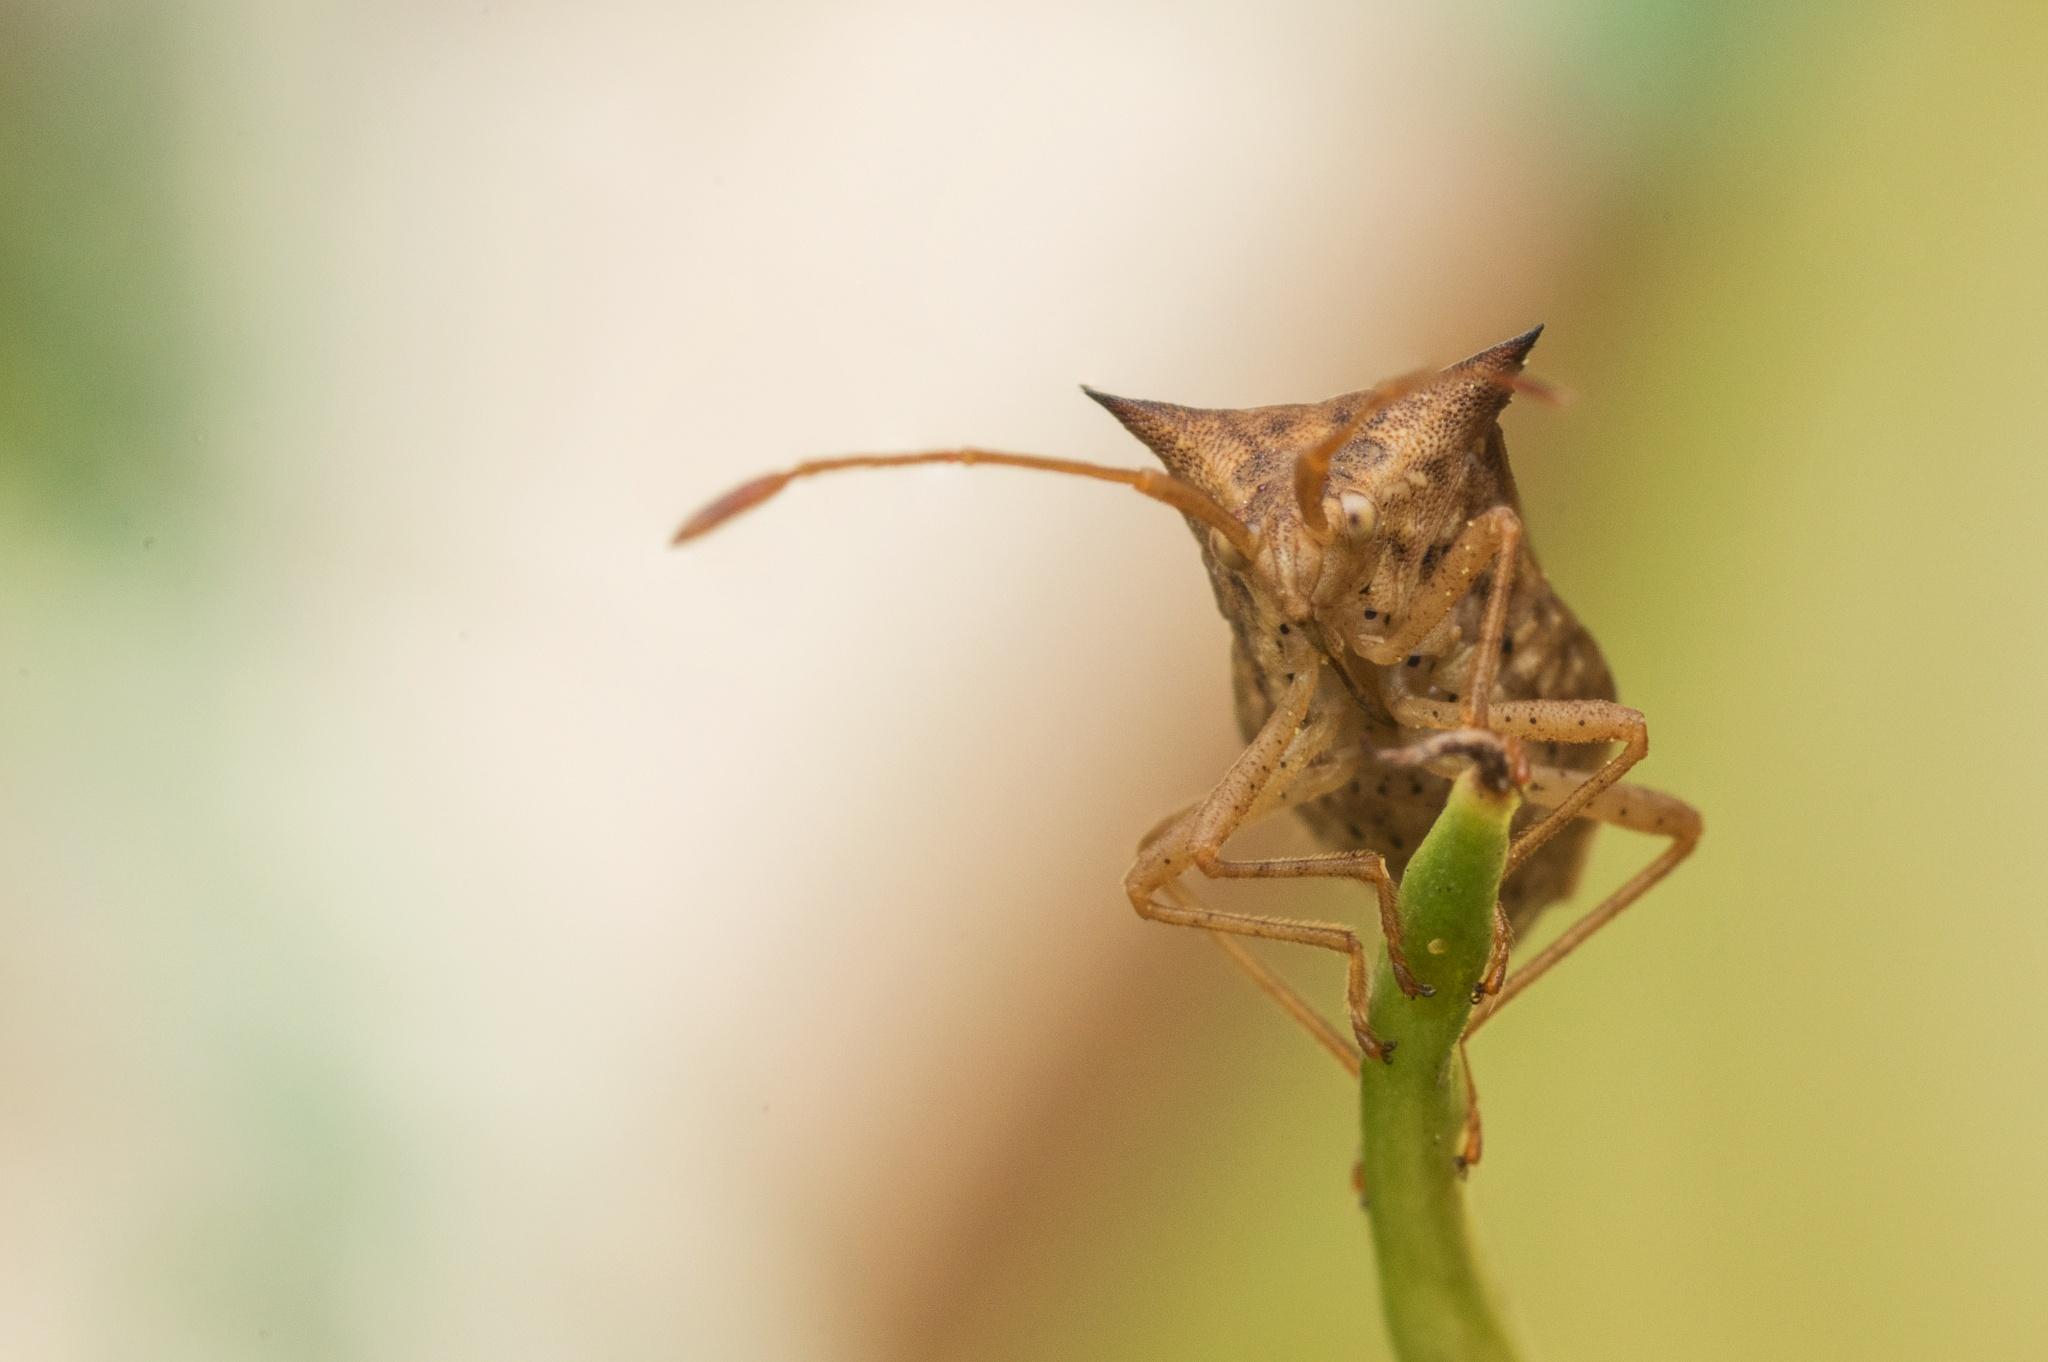 Sentinel Stink Bug by Mika Andrianoelison